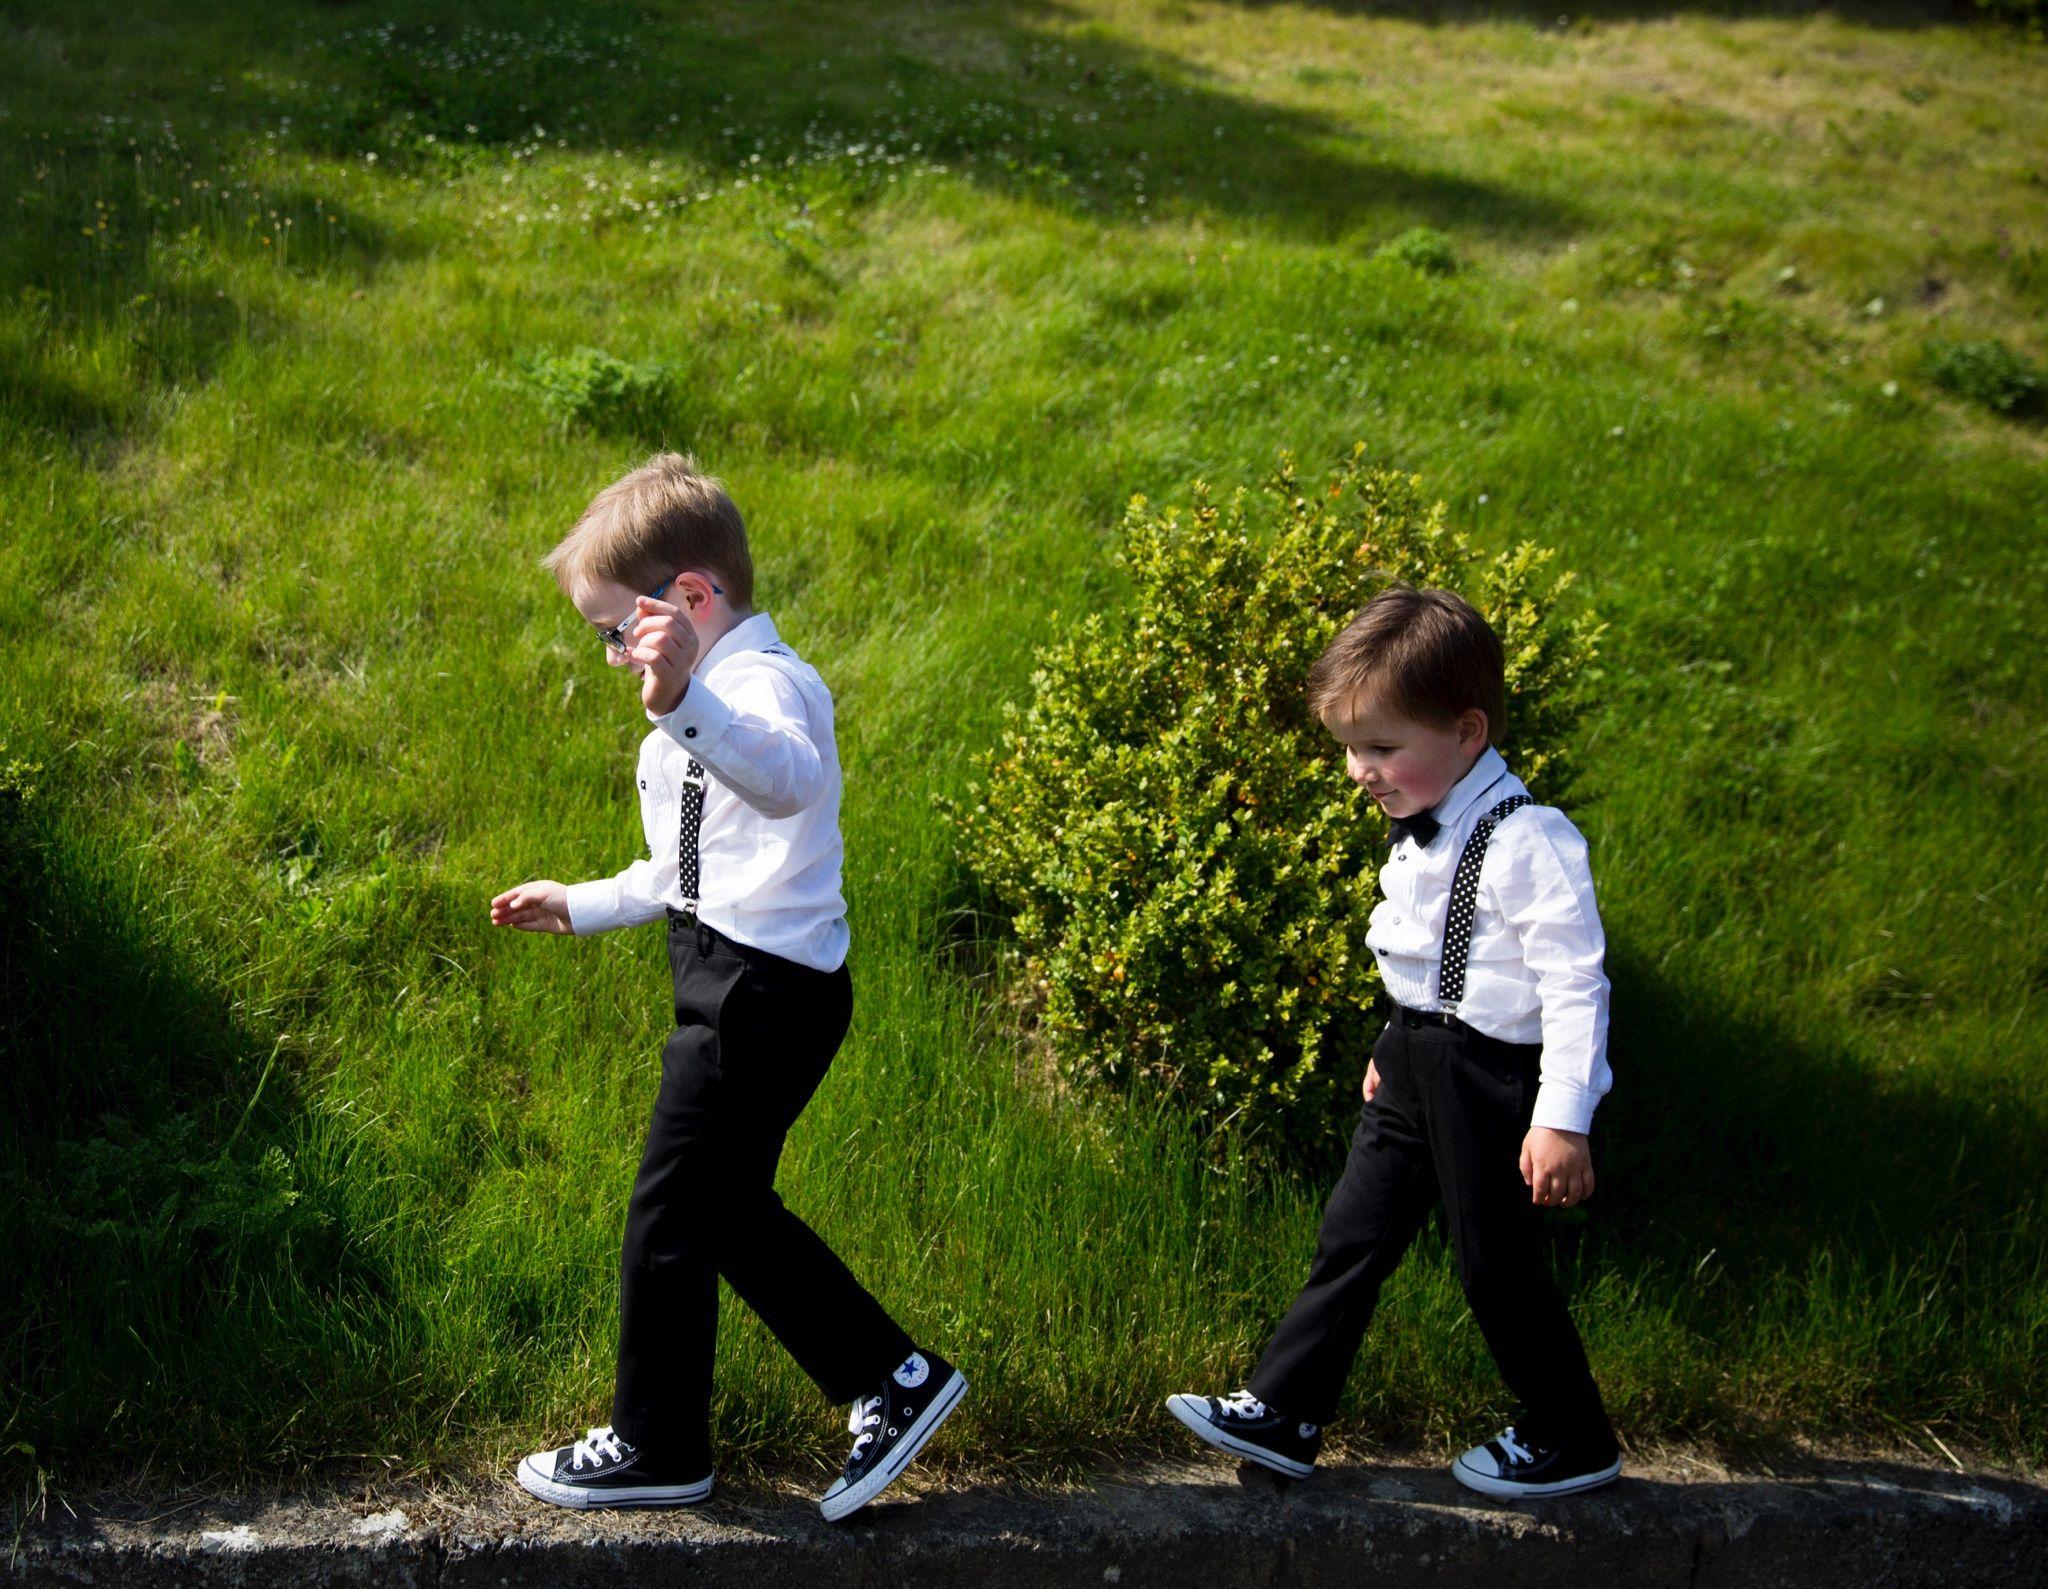 #wedding #pageboys #braces #converse #bellinghamcastle #nephews #clairebaker #juliecumminsphotography